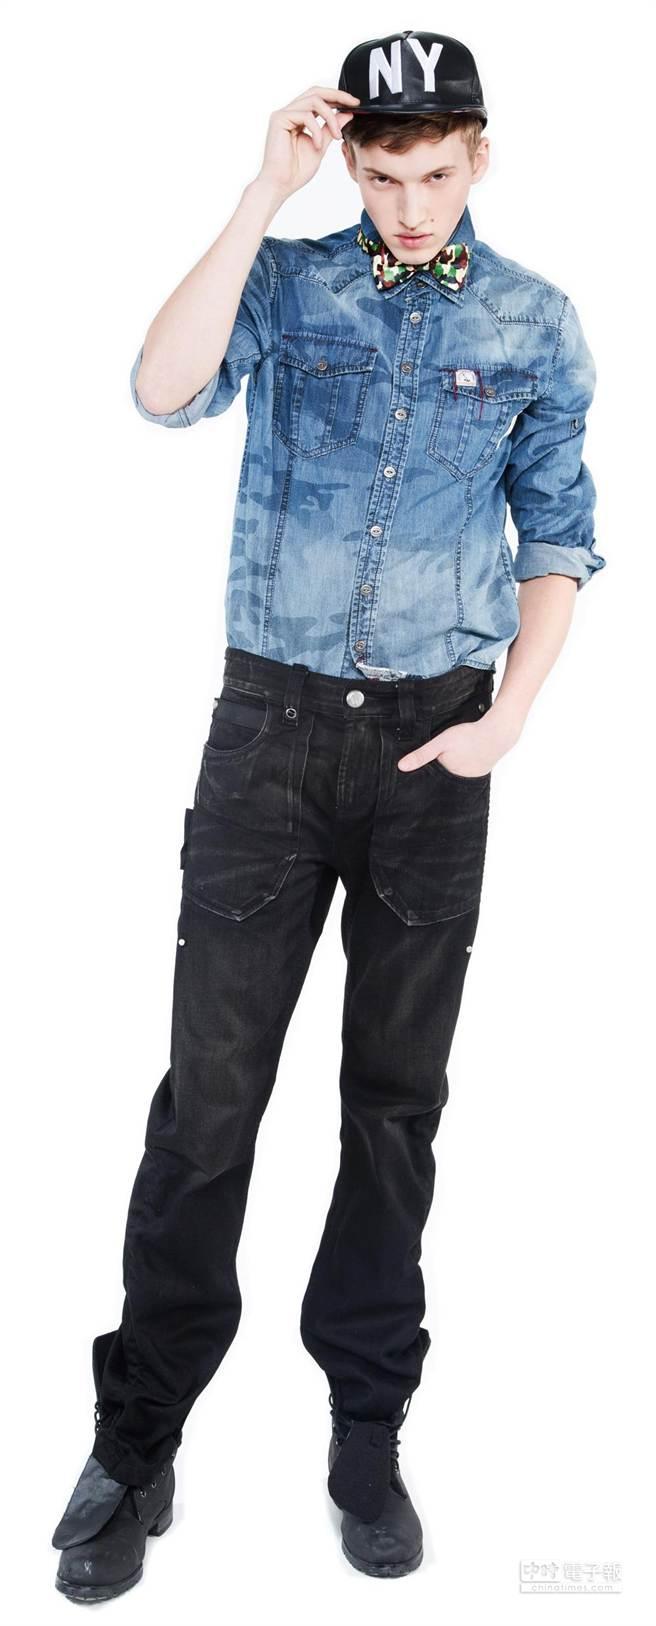 TOUGH Jeansmith推出捐格紋或花襯衫,即可以4折價購買春夏新款襯衫活動。(TOUGH Jeansmith提供)